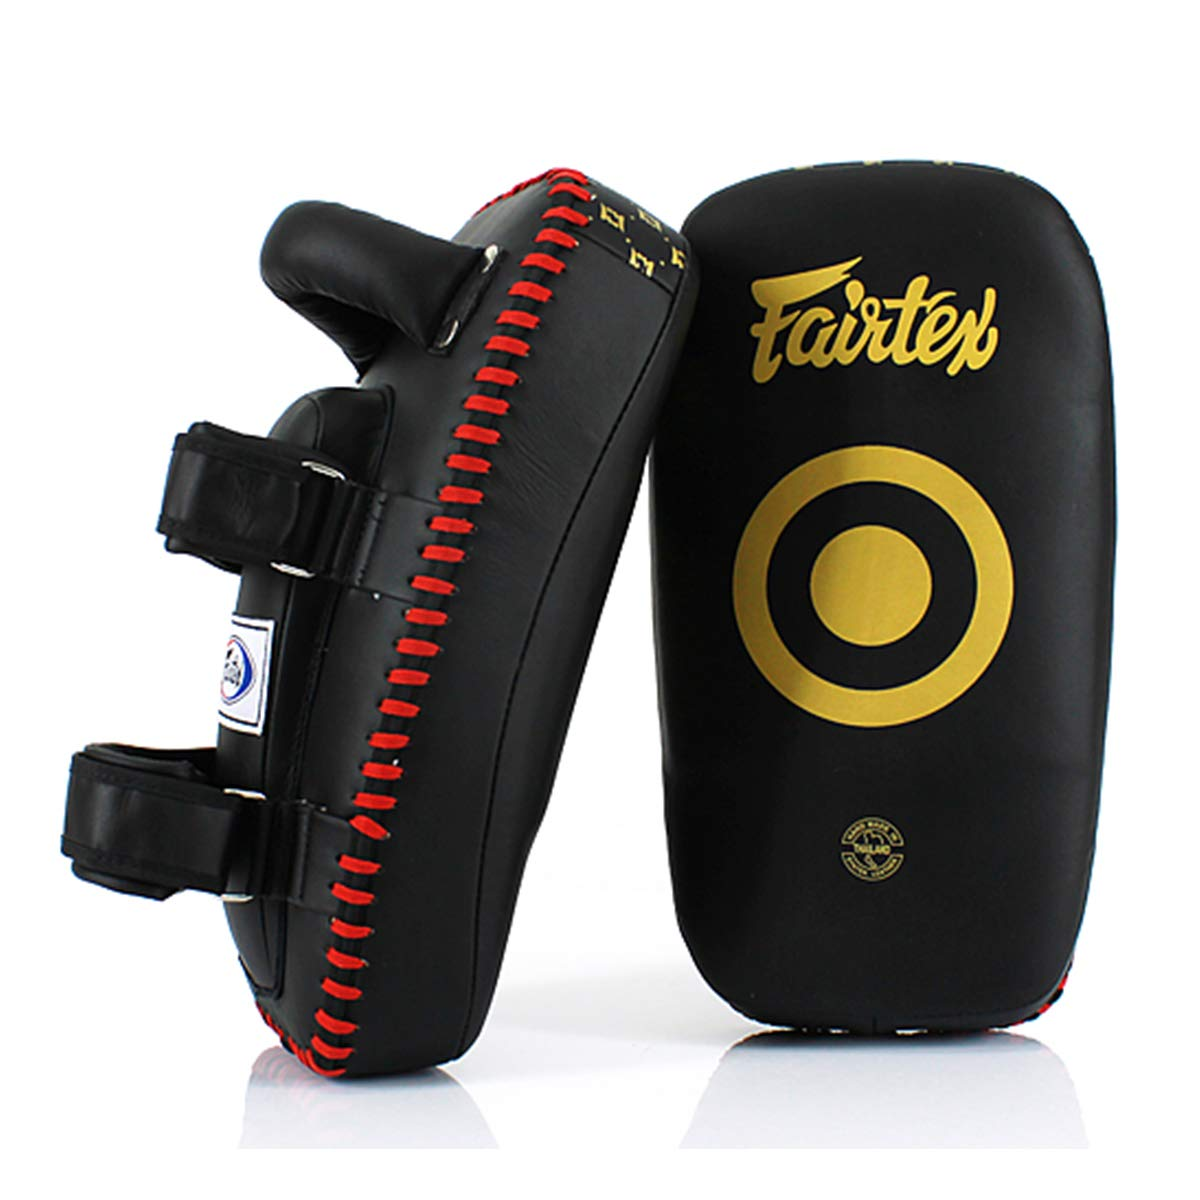 Fairtex B075M3FK9Z kplc5軽量キックパッド Fairtex B075M3FK9Z, 株式会社ミヤタコーポレーション:059f7418 --- capela.dominiotemporario.com